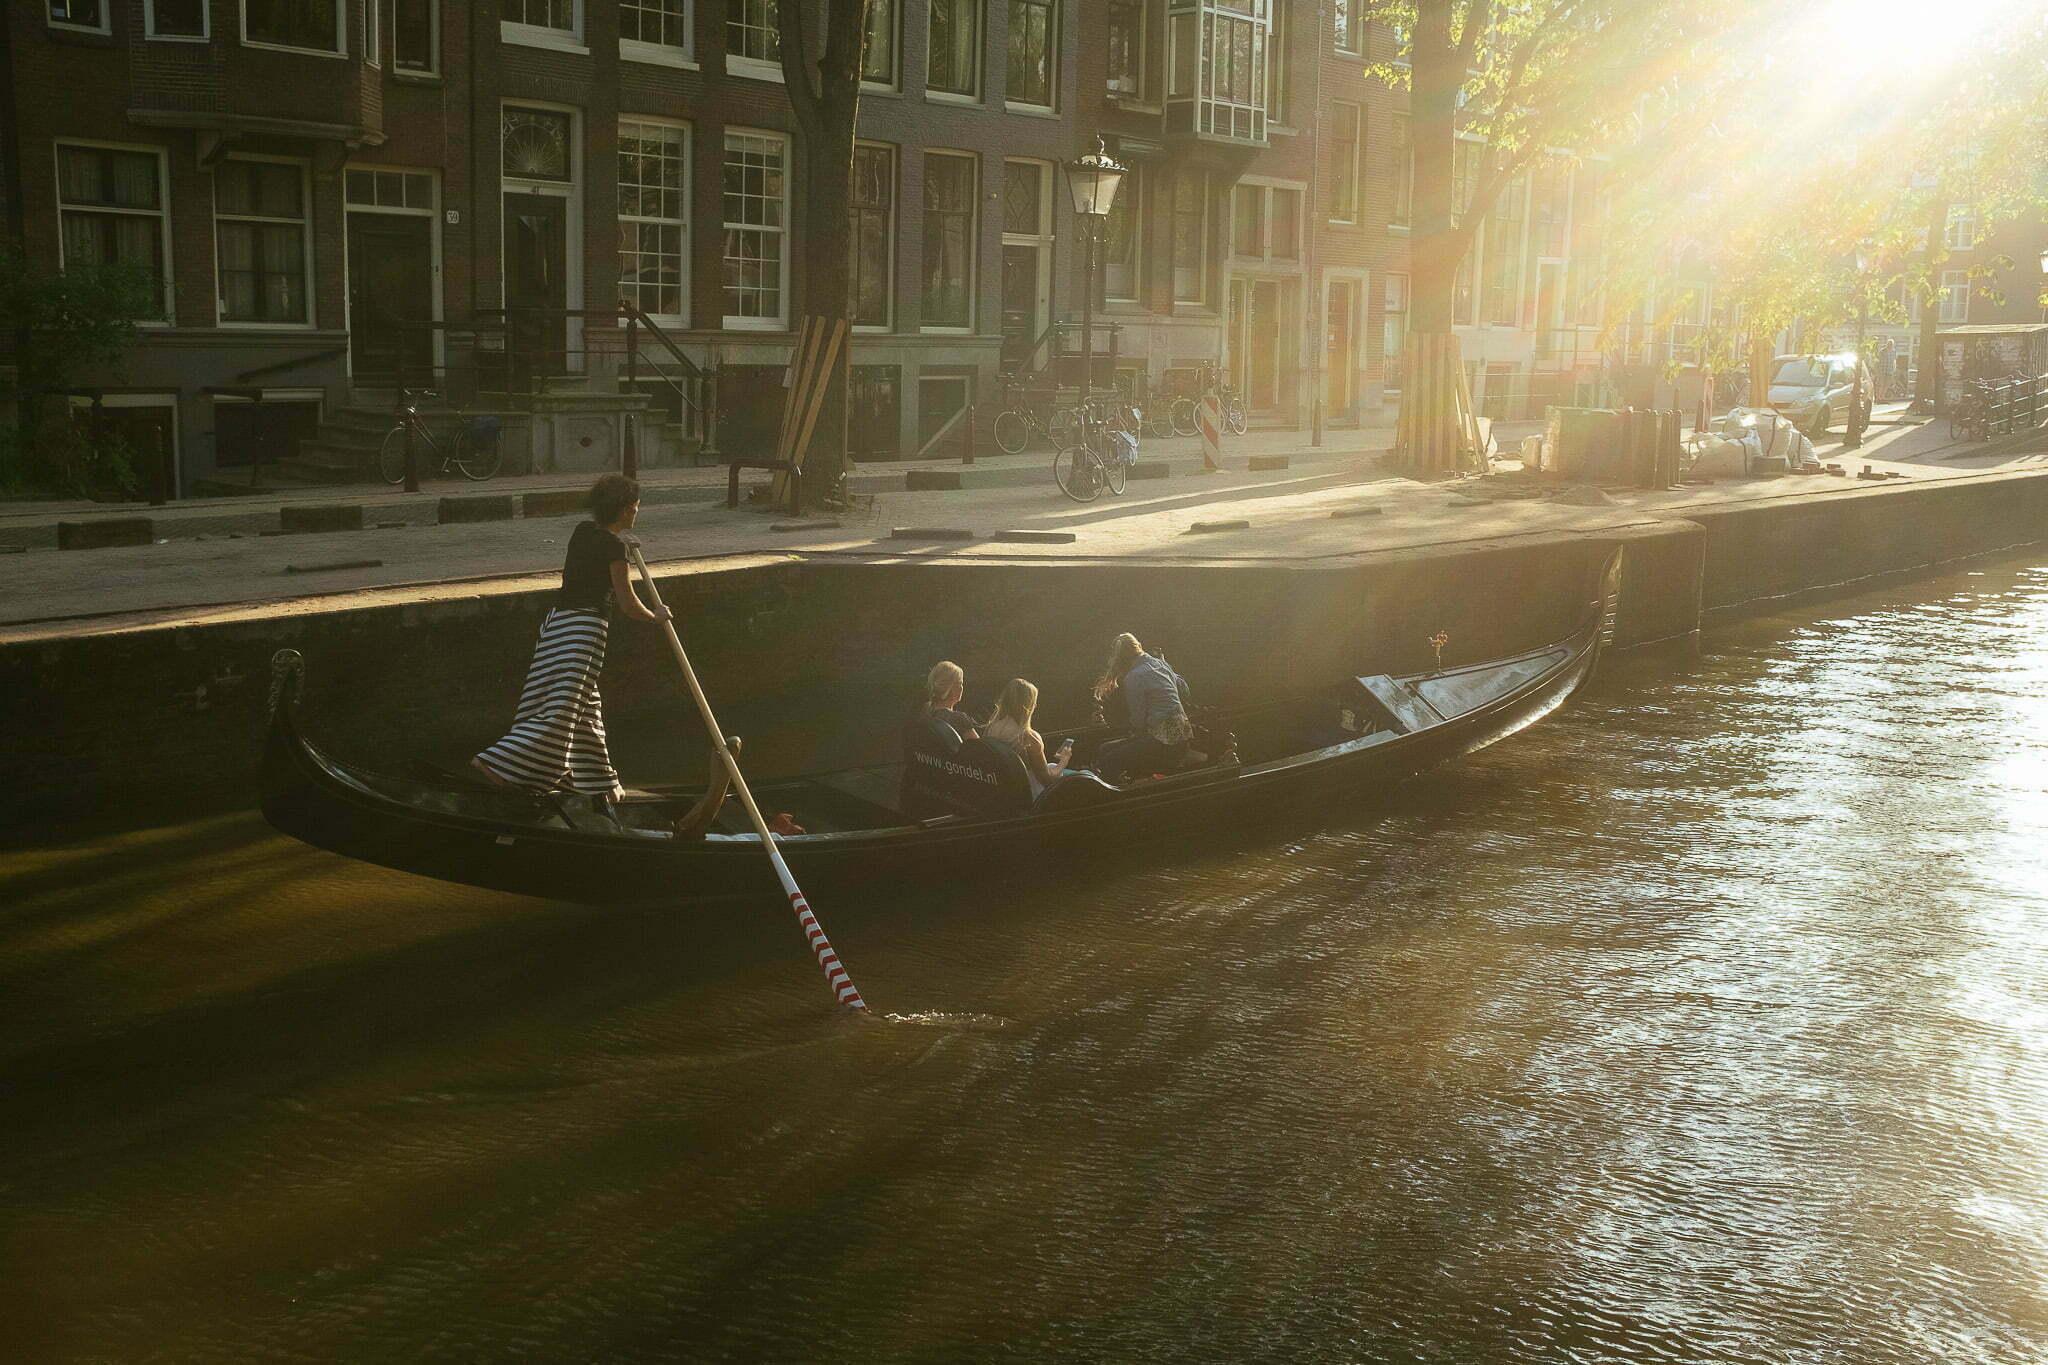 amsterdam-3377-pete-carr